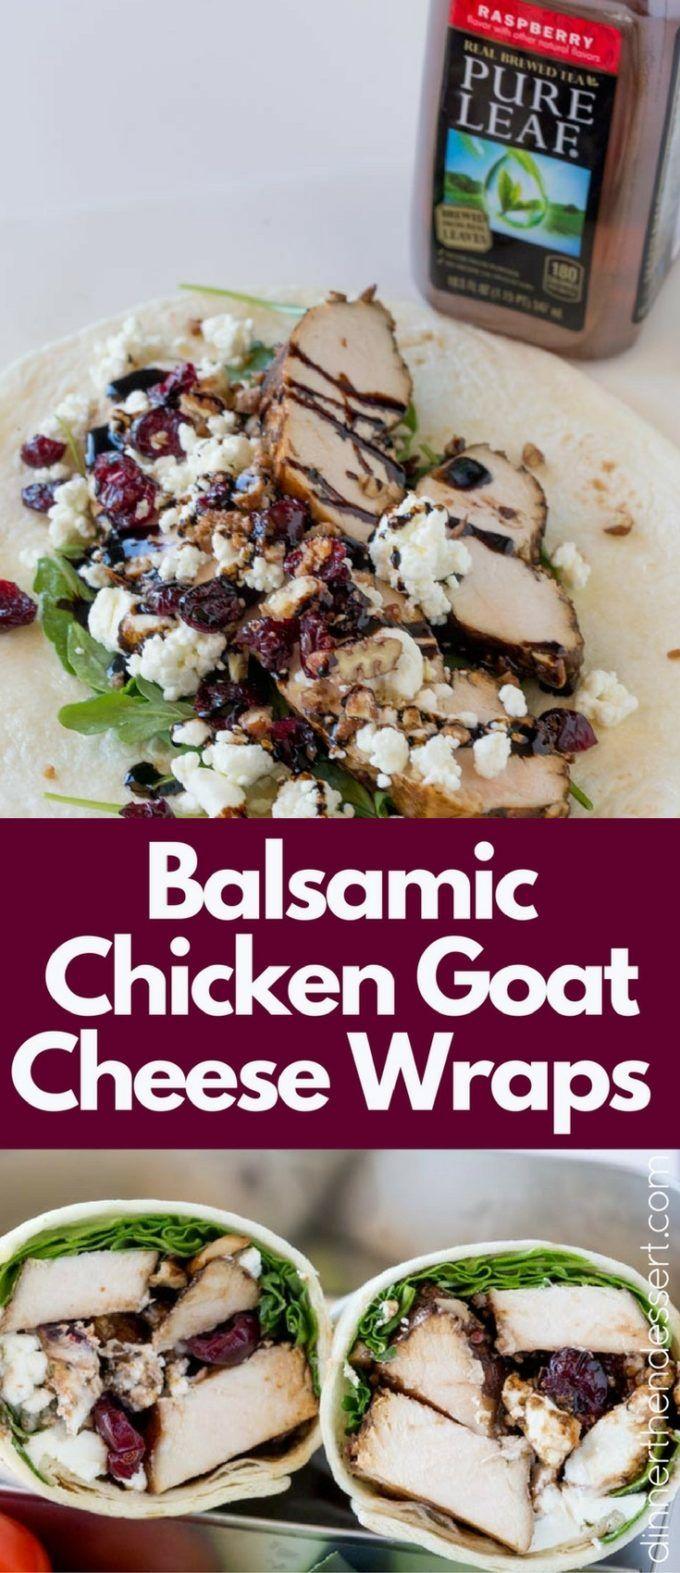 25+ Best Ideas about Roasted Chicken Breast on Pinterest ...